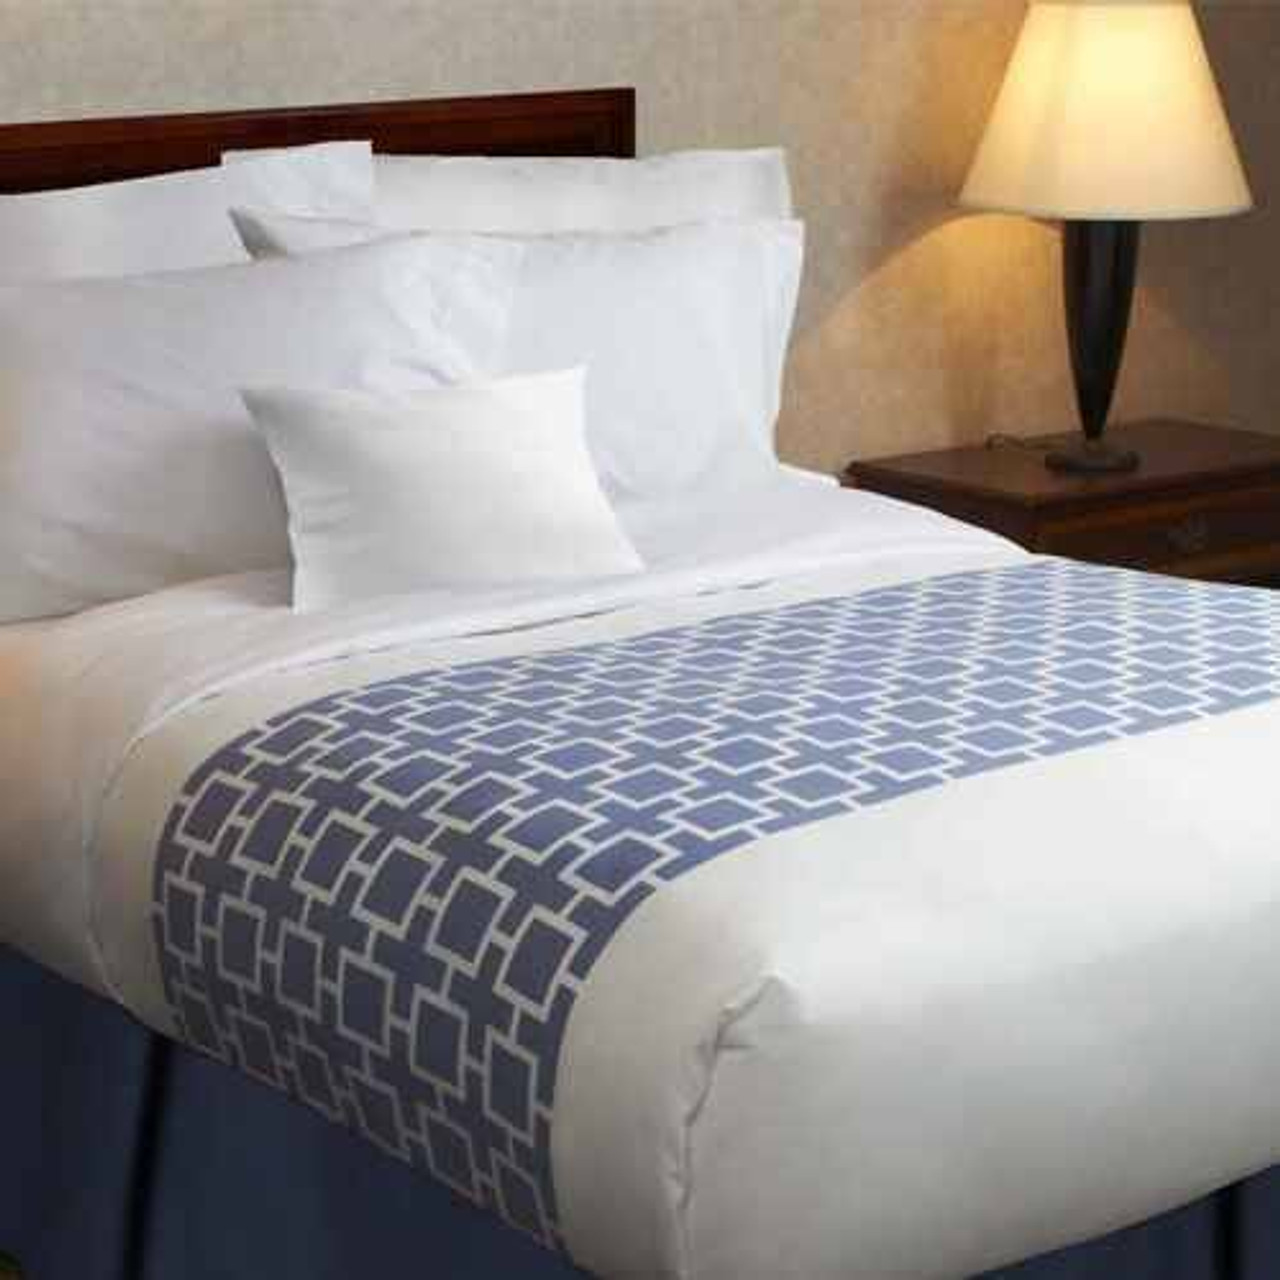 1888 Mills 1888 Mills or Beyond Impressions Prints or Bed Scarf or Blue - Beige - Green - Grey Designs or Pack of 12